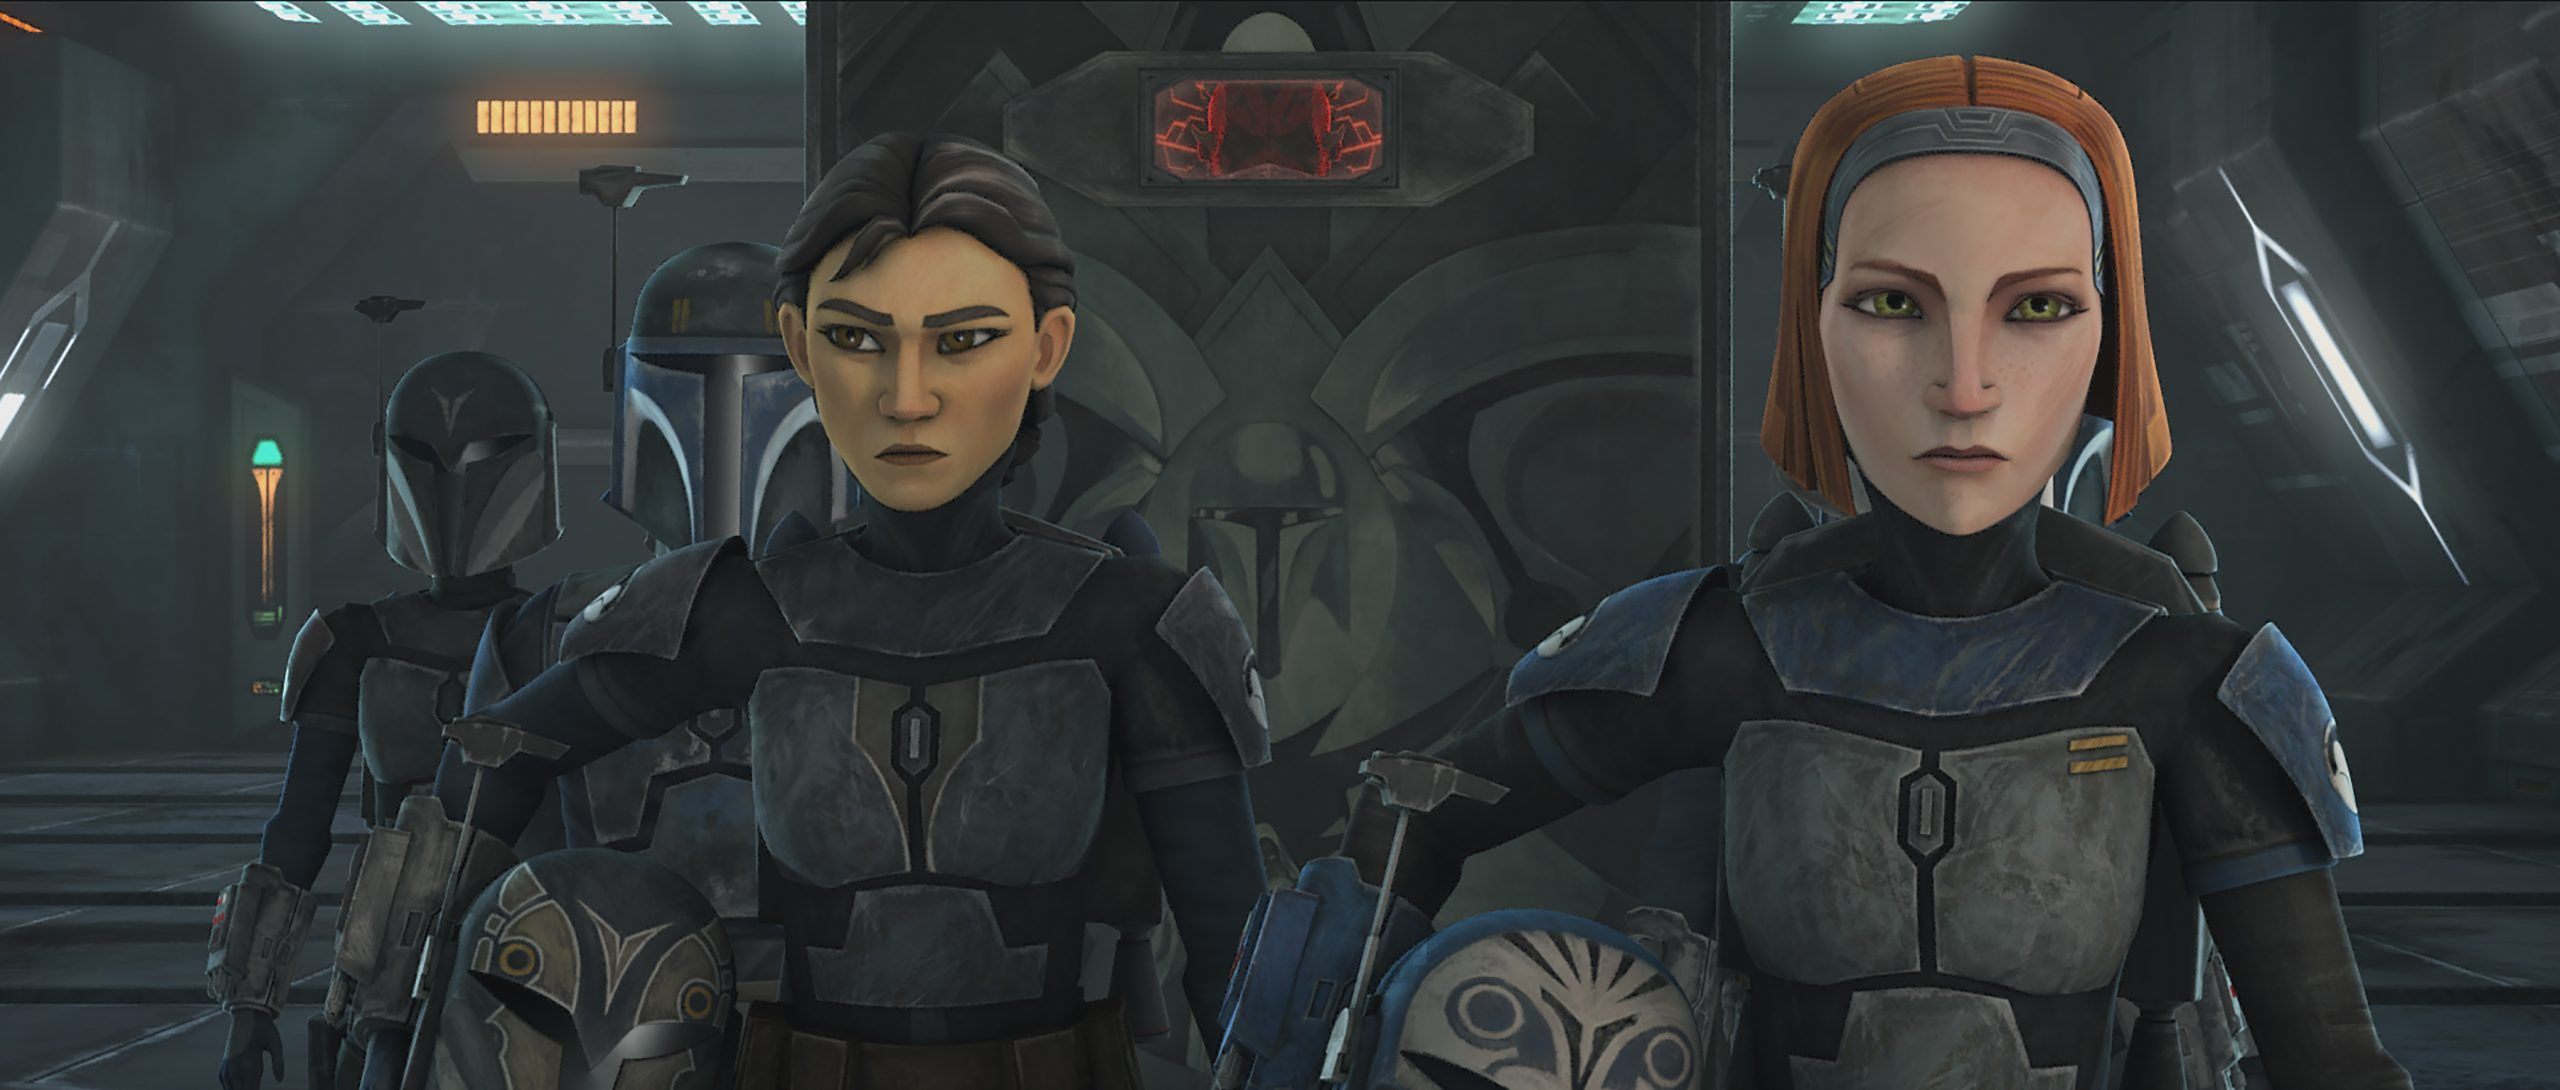 Clone Wars Season 7